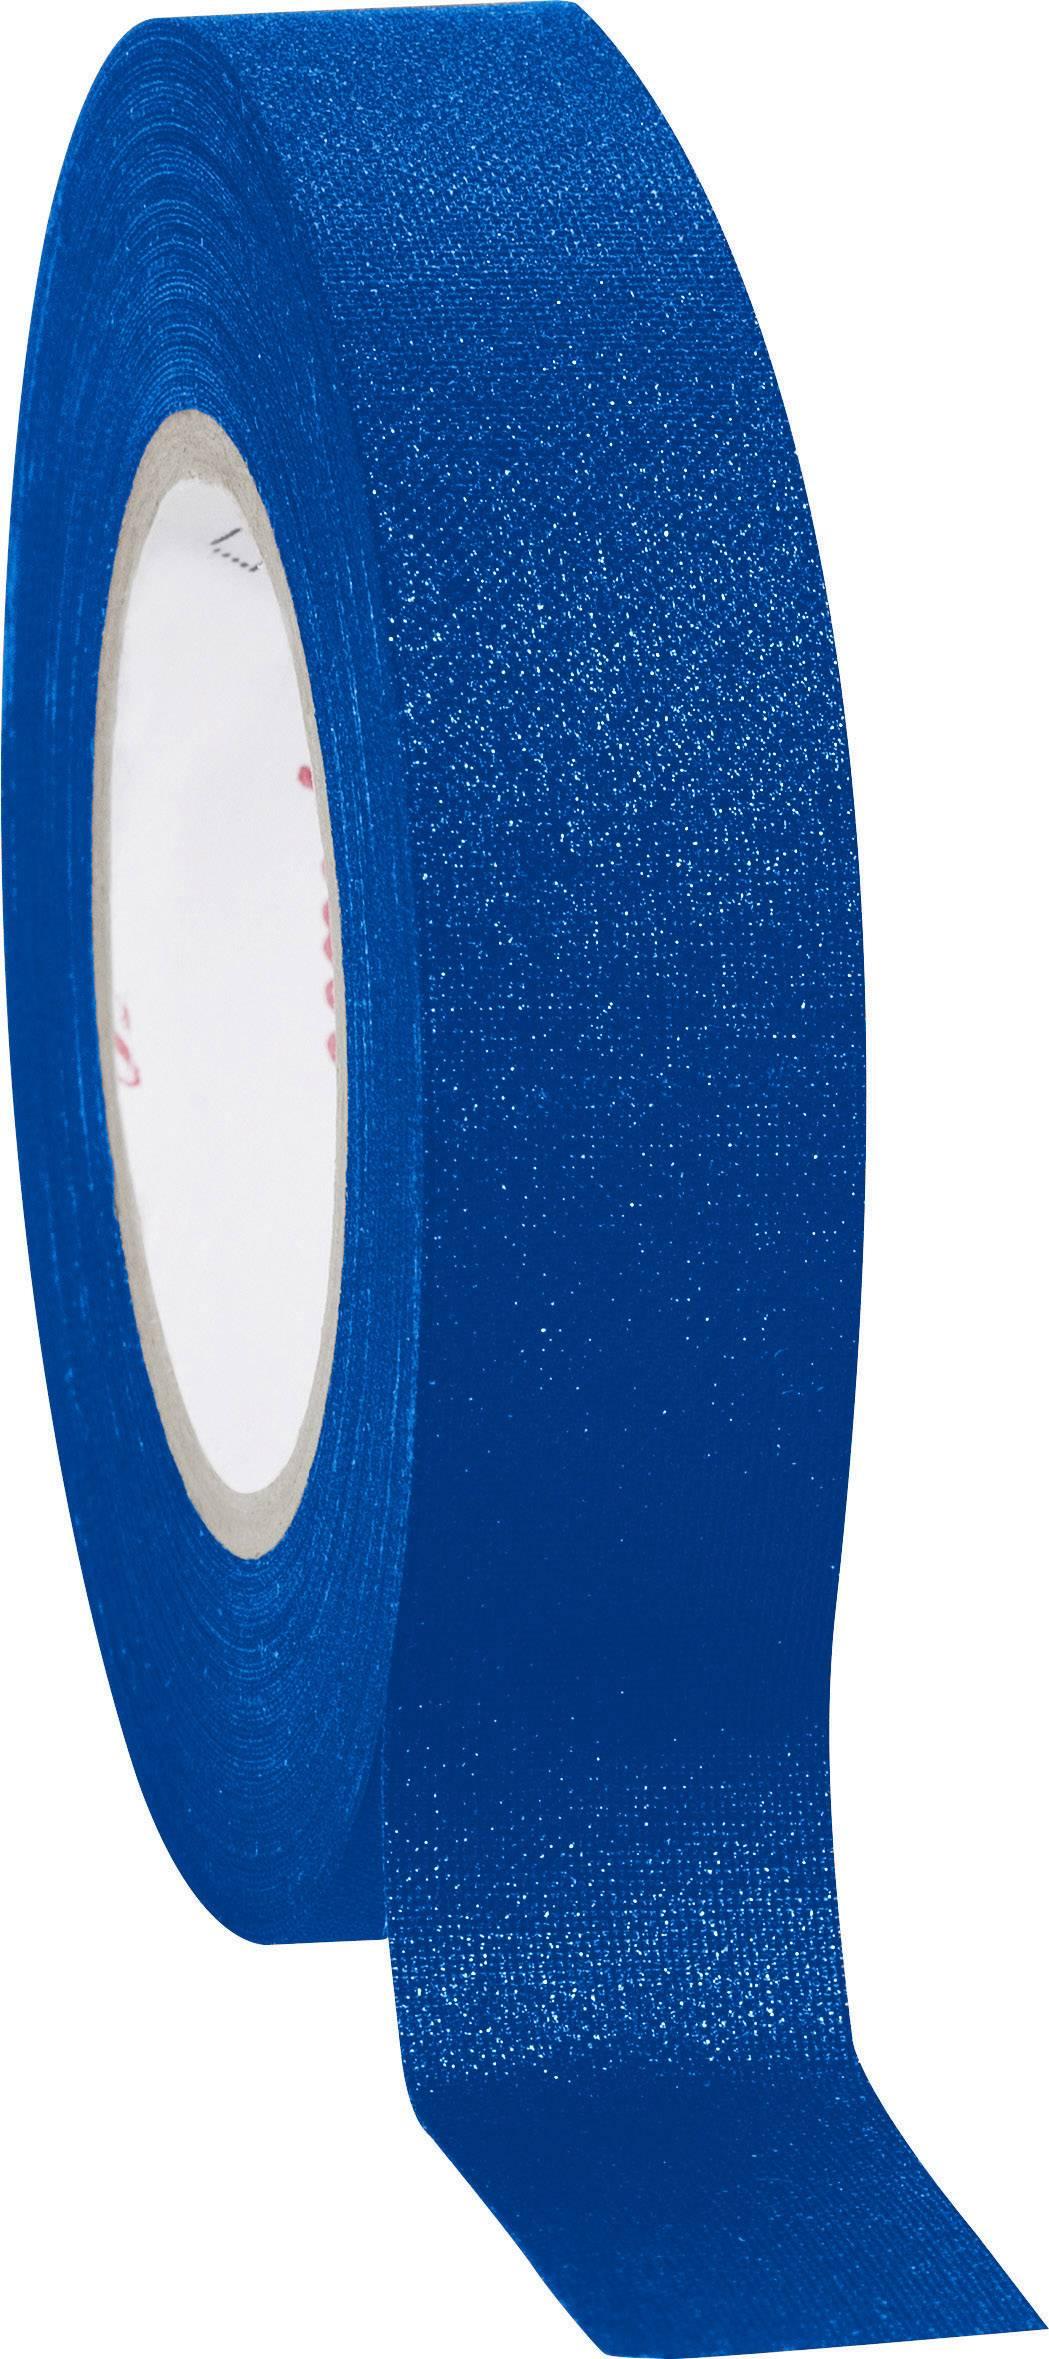 Páska so skleným vláknom Coroplast 16892 16892, (d x š) 10 m x 15 mm, modrá, 1 roliek